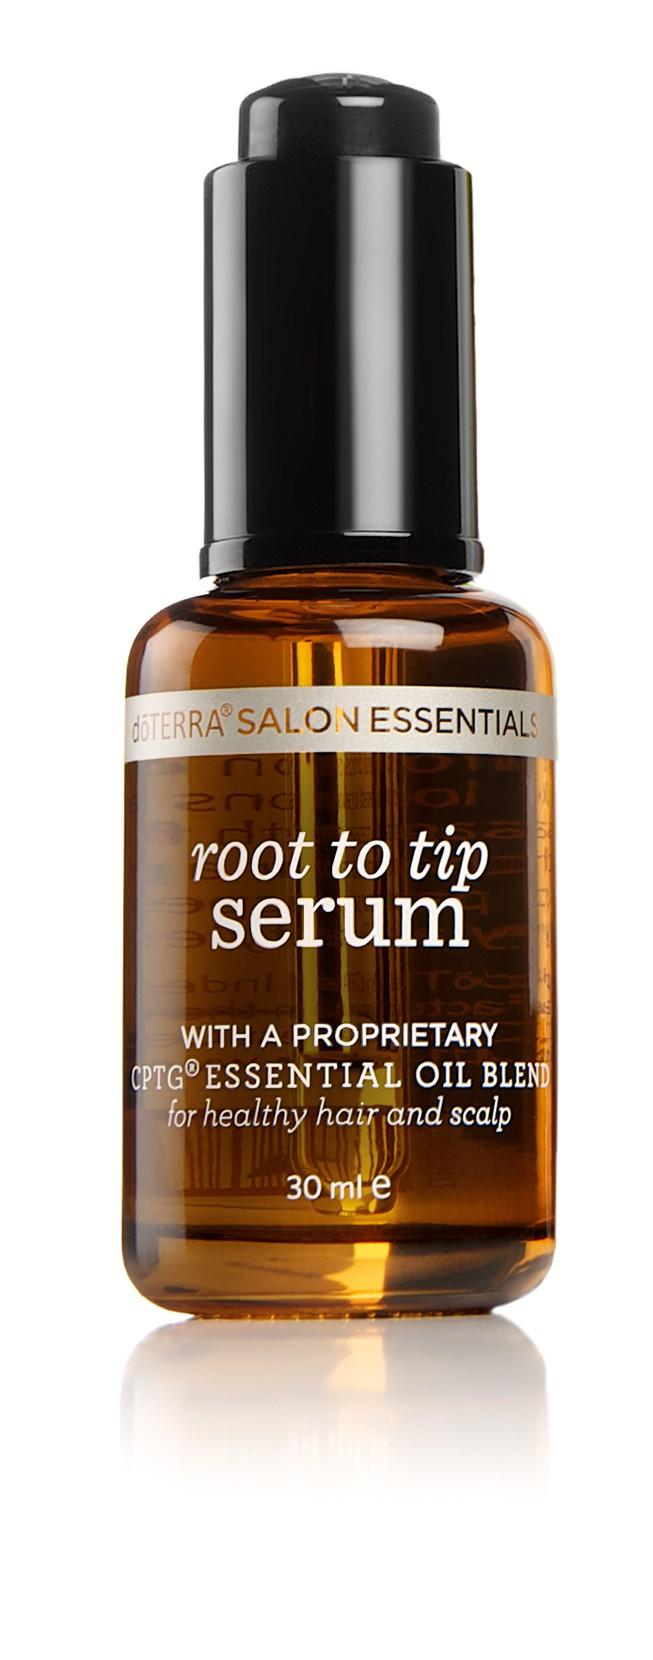 244dd9be27a Salon Essentials Root to Tip Serum 30 mL - Aroma Good Stuff ...